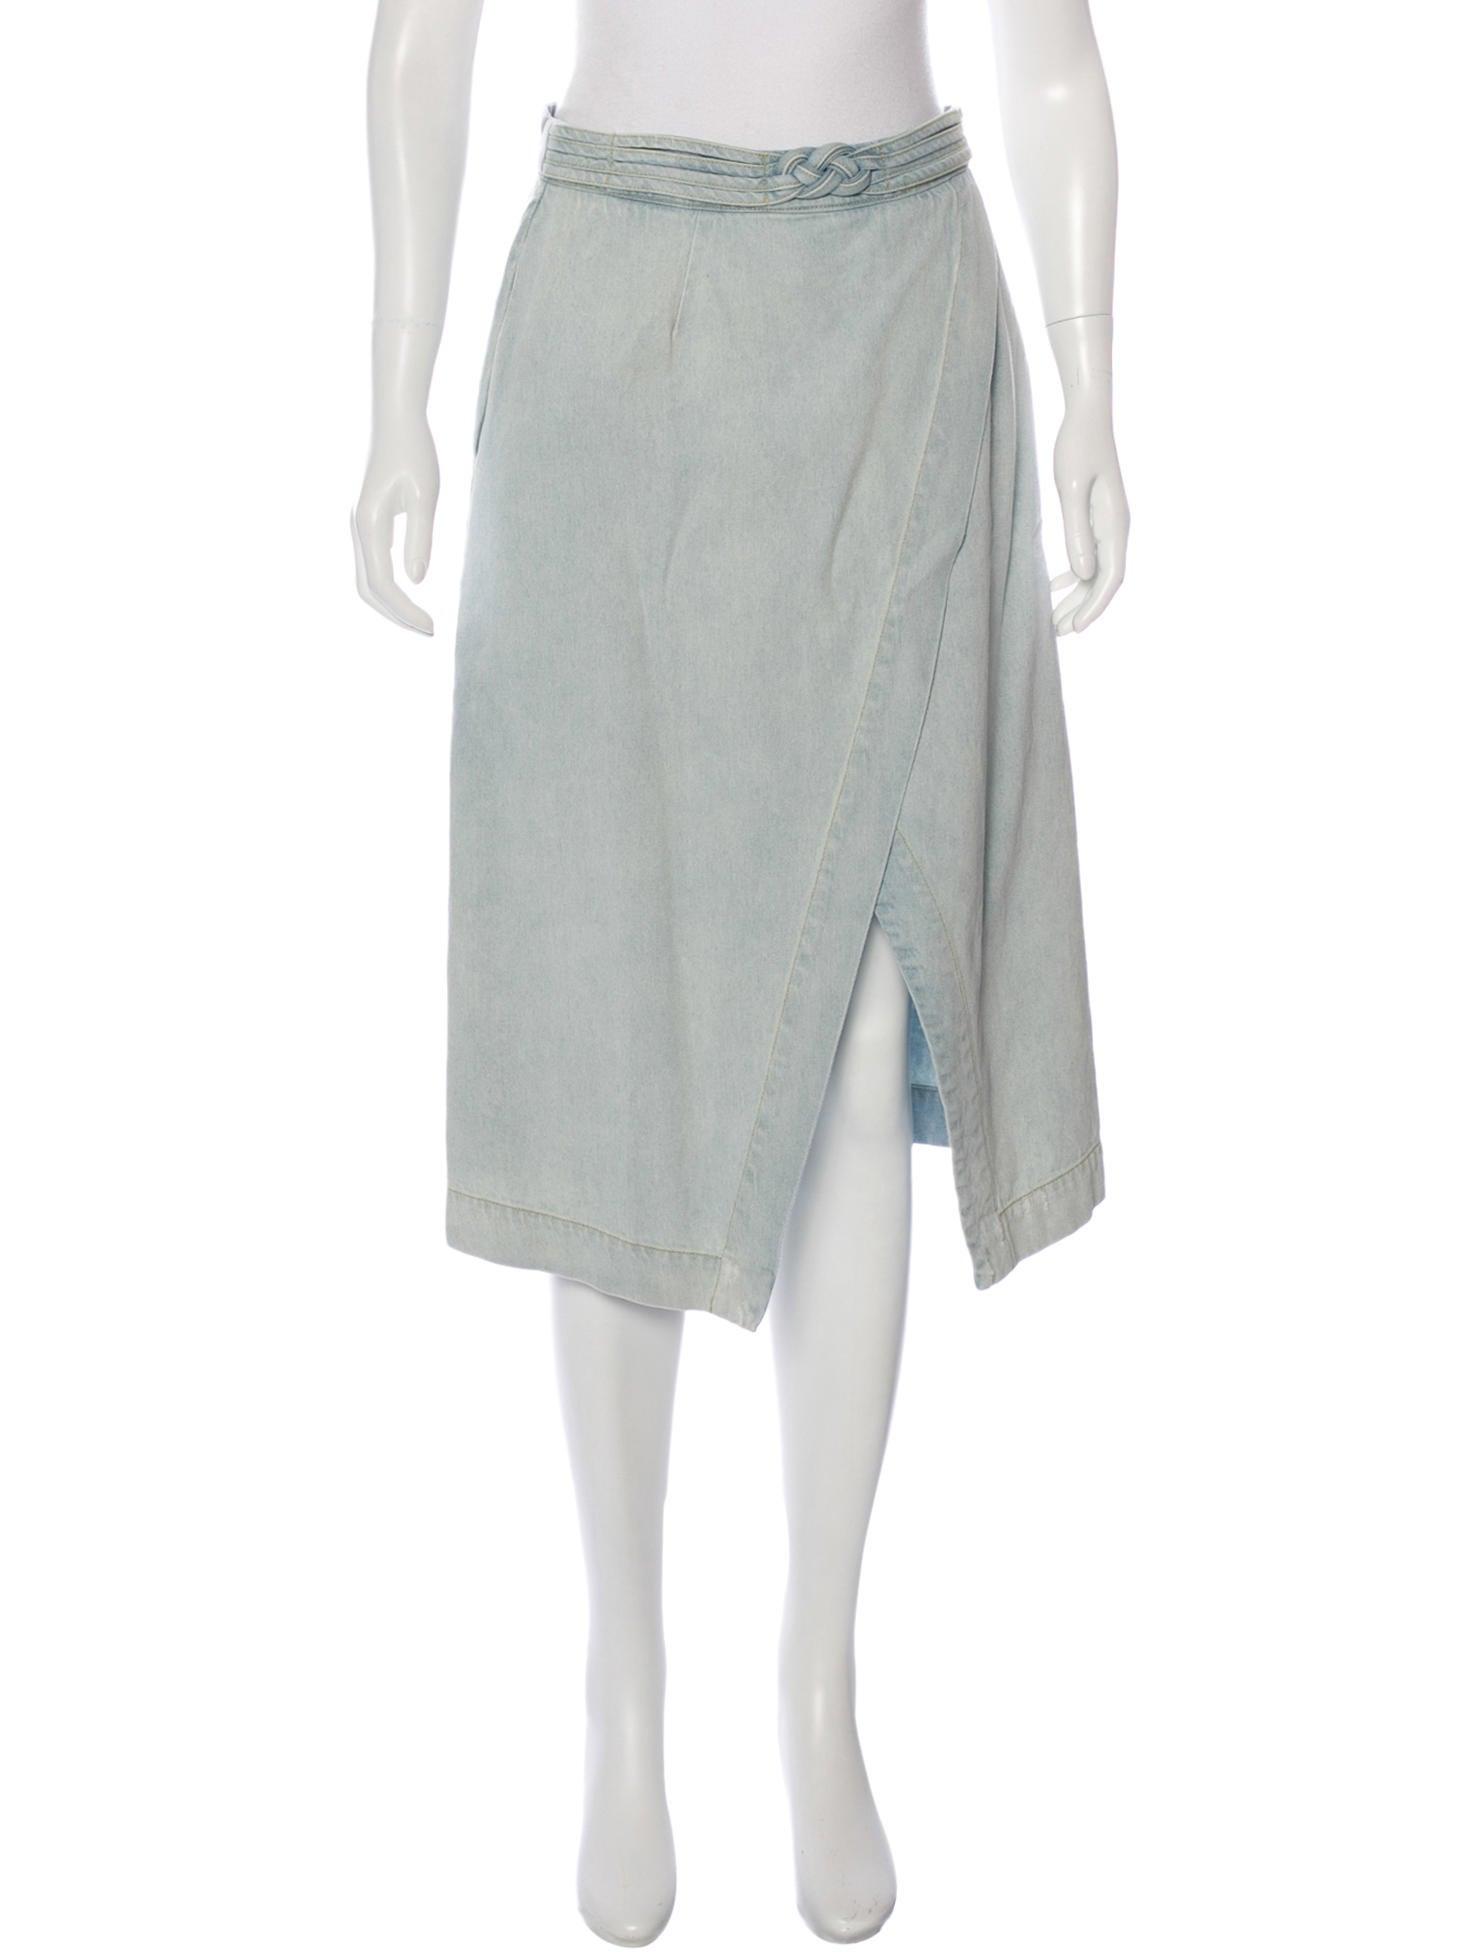 sea denim knee length skirt clothing wssea22550 the